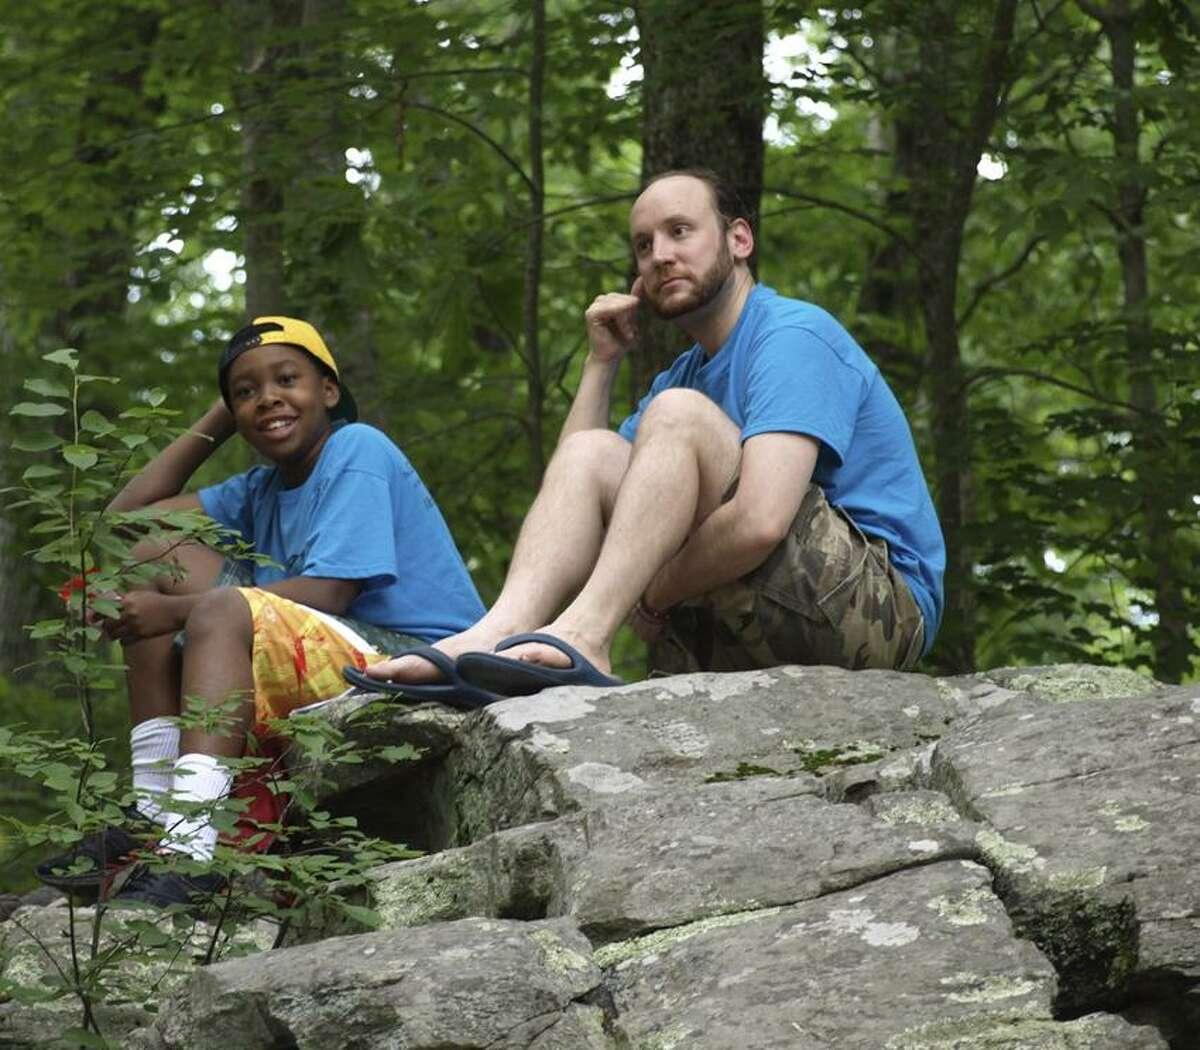 rmfeldman photo: Tyrease Pouncey Jr. and Teaching Artist Michael Walkup, improvise a scene at the Camp Wightman writing retreat.